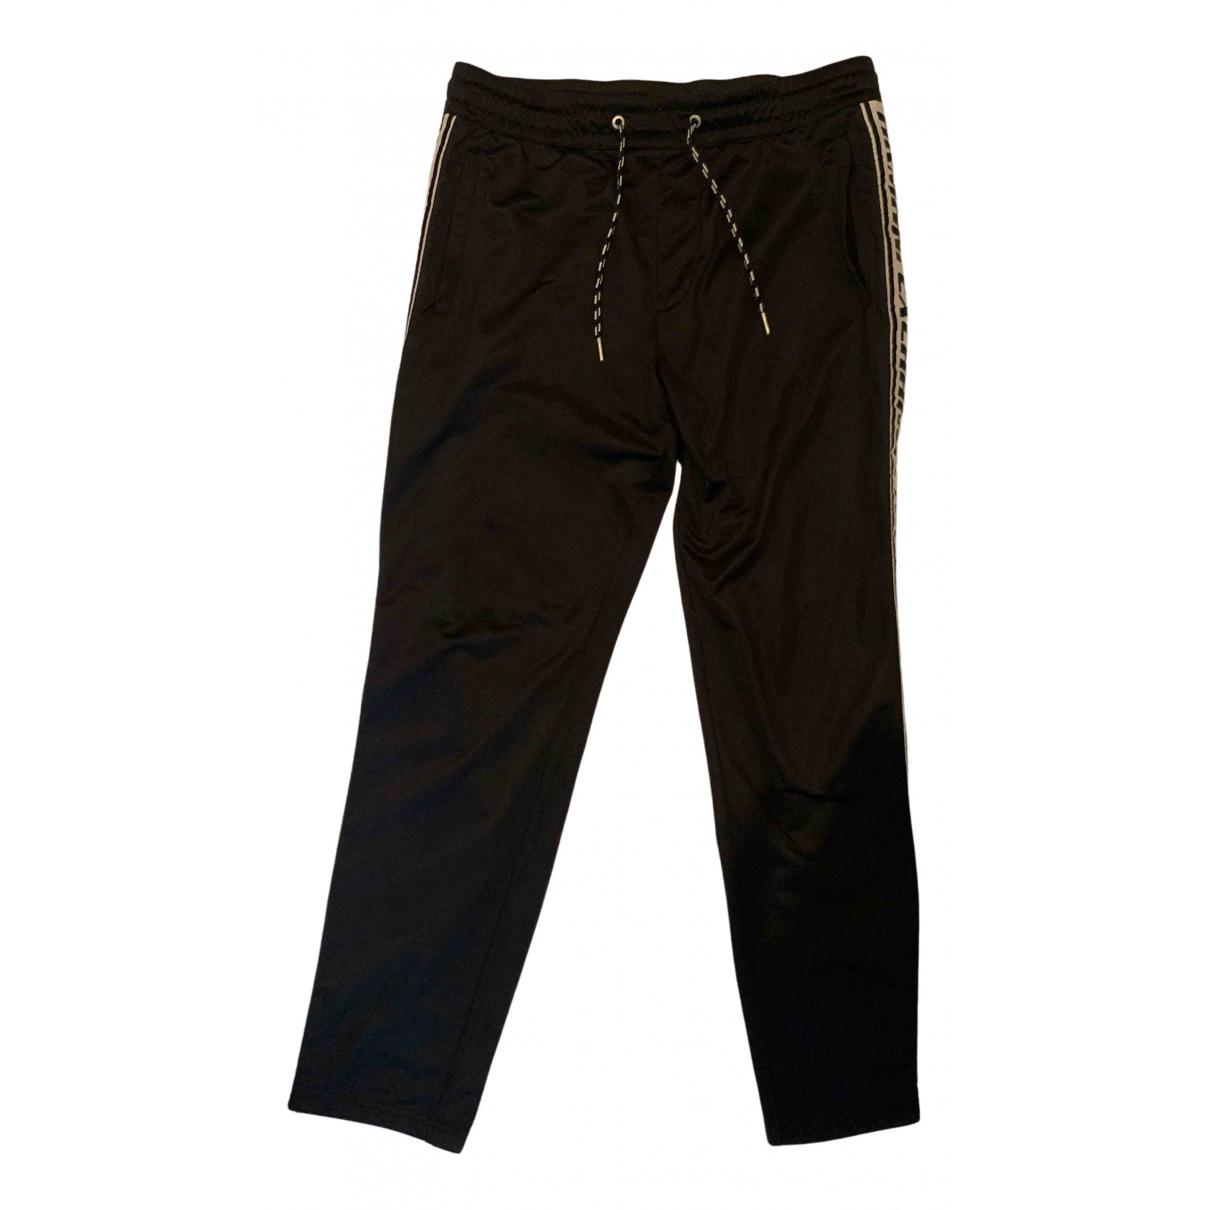 Emporio Armani N Black Trousers for Men M International